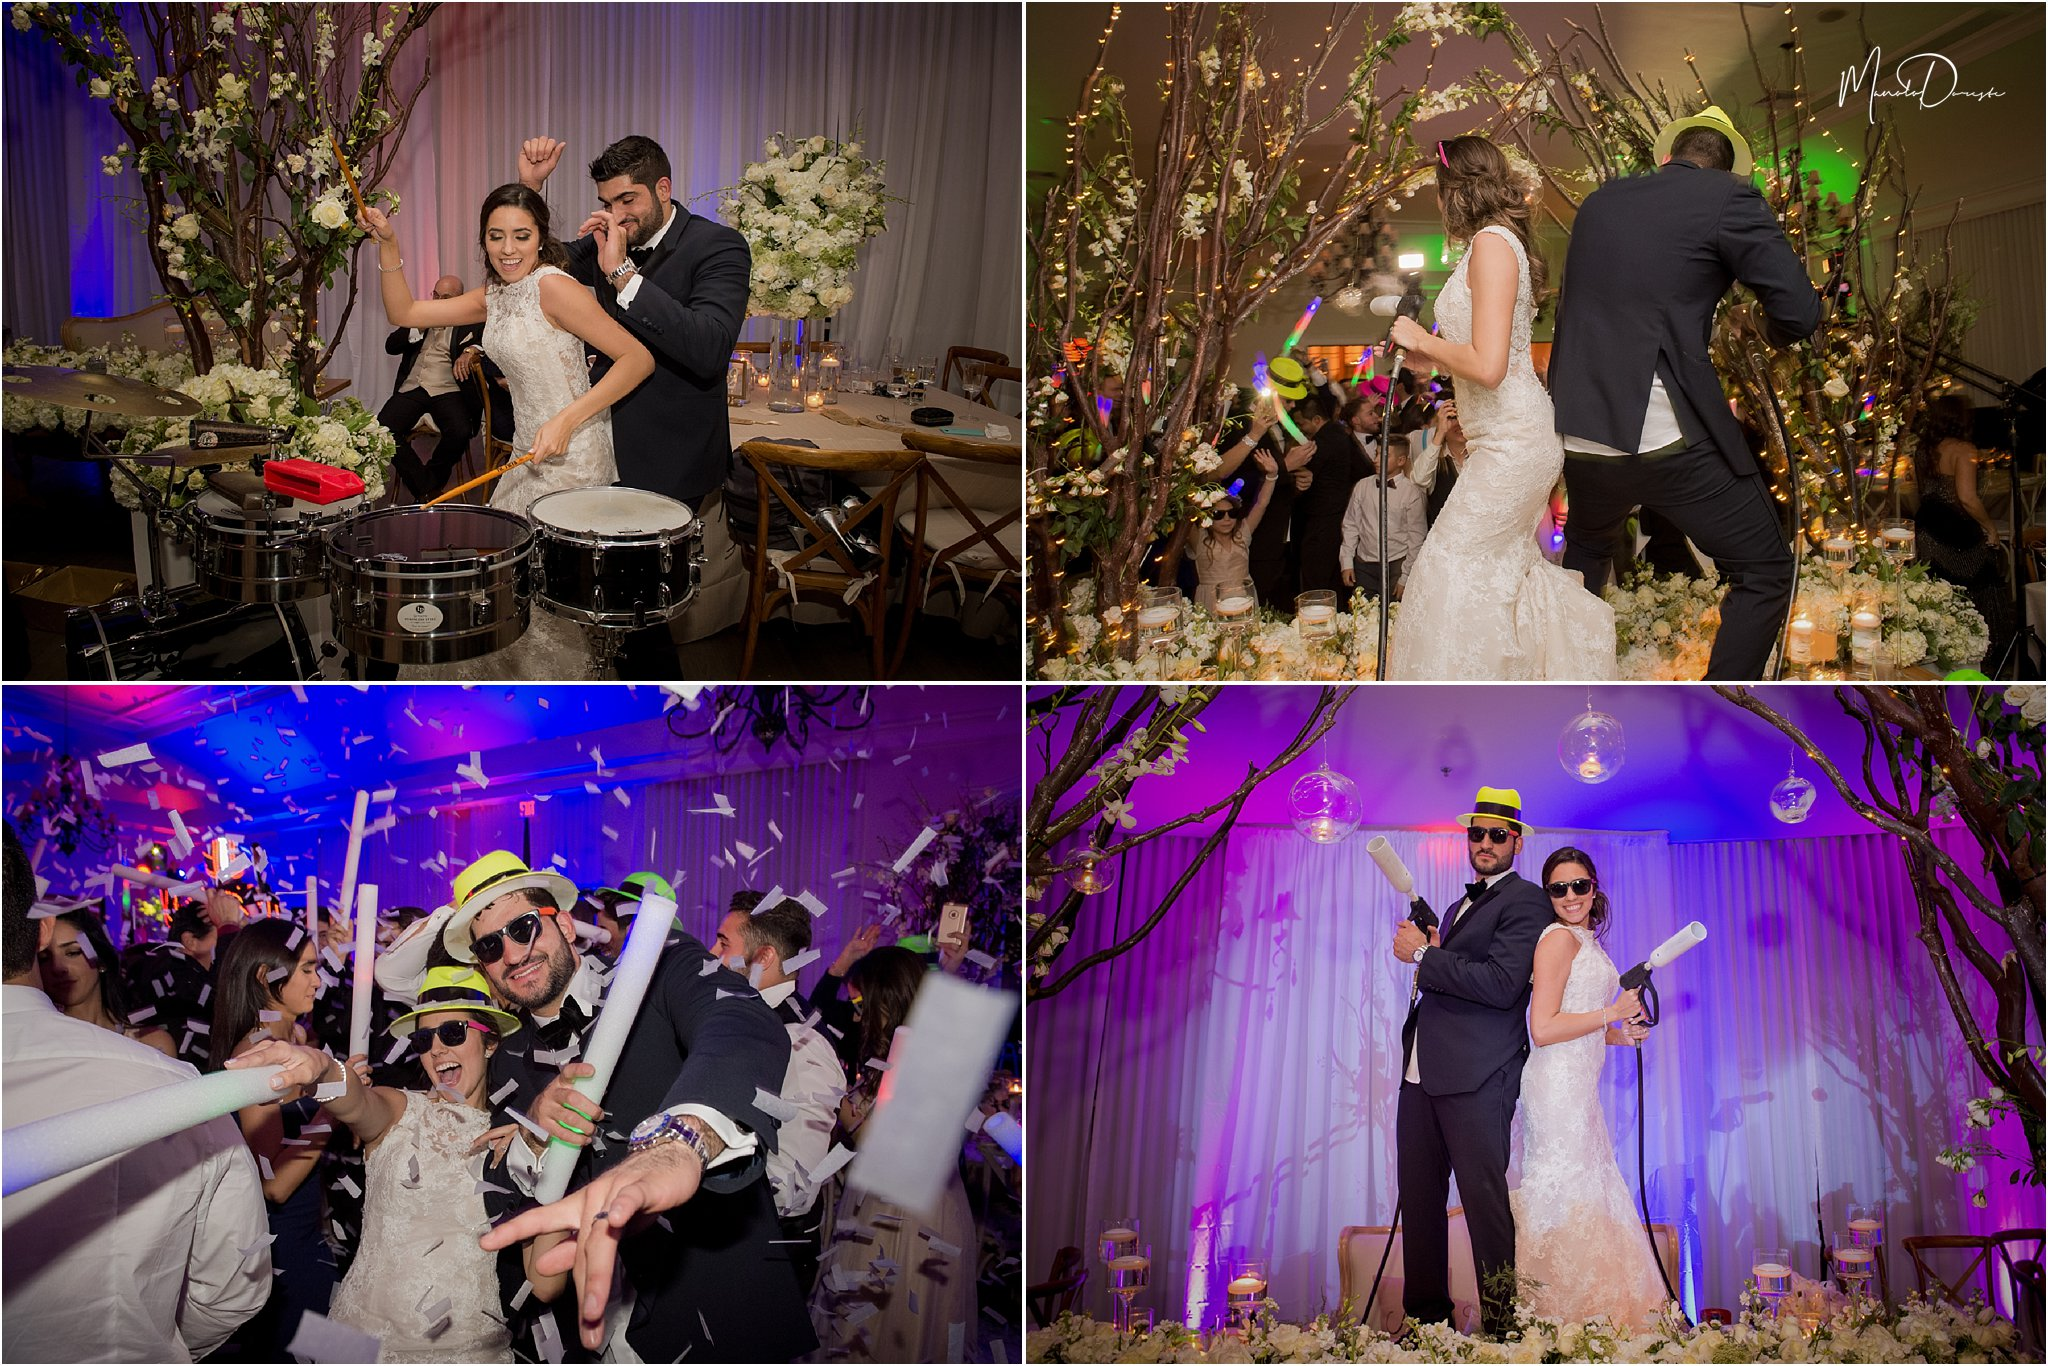 00946_ManoloDoreste_InFocusStudios_Wedding_Family_Photography_Miami_MiamiPhotographer.jpg